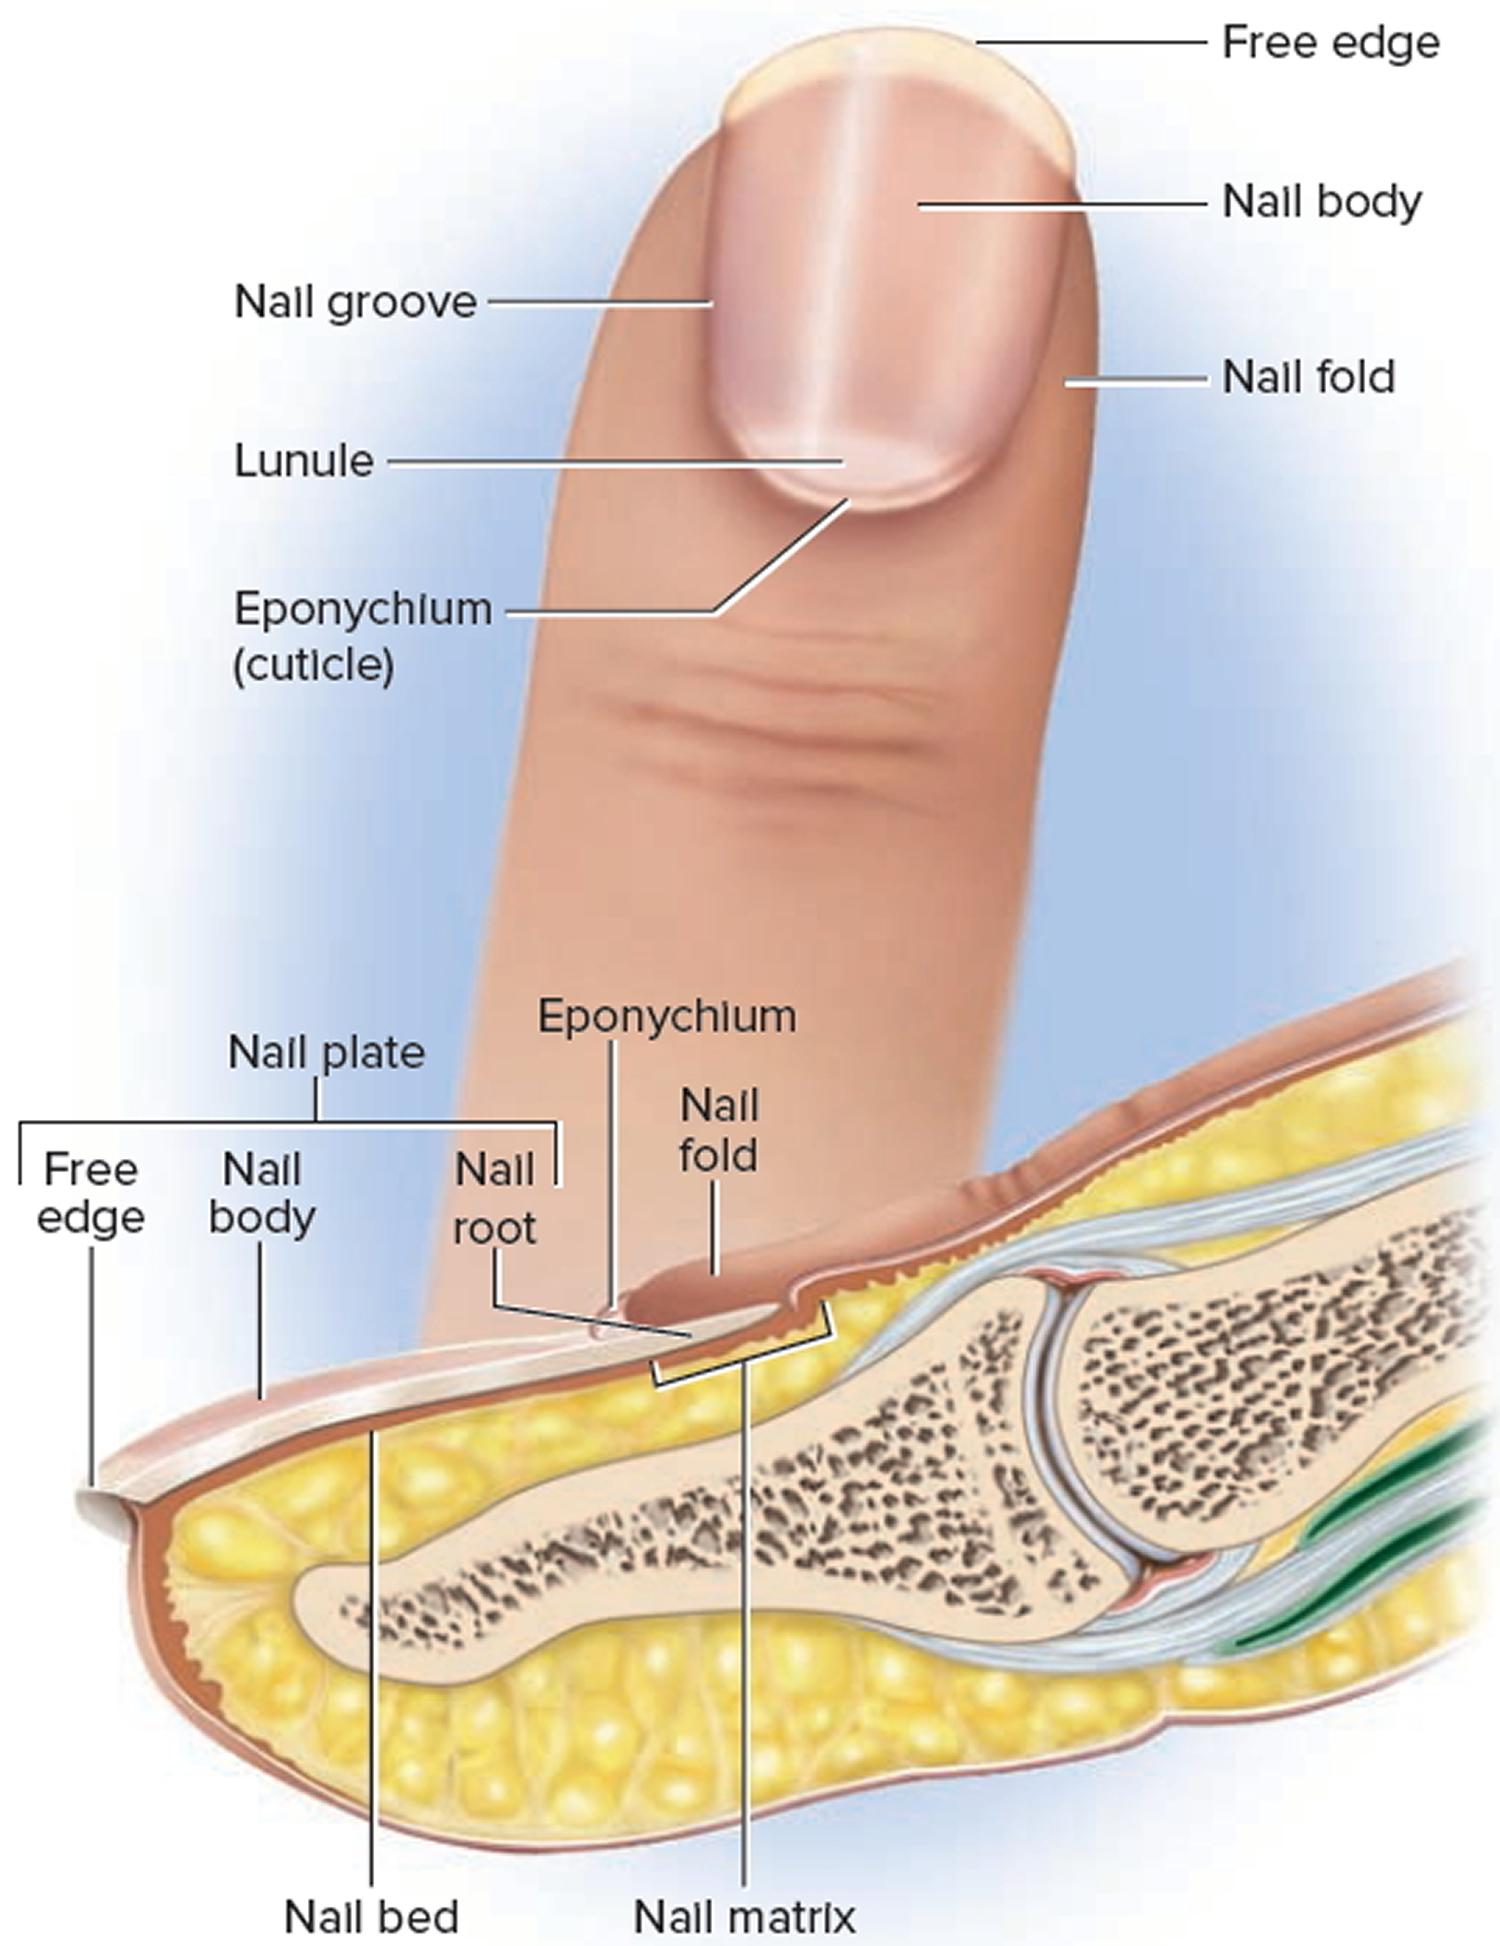 Onychomycosis of the fingernails